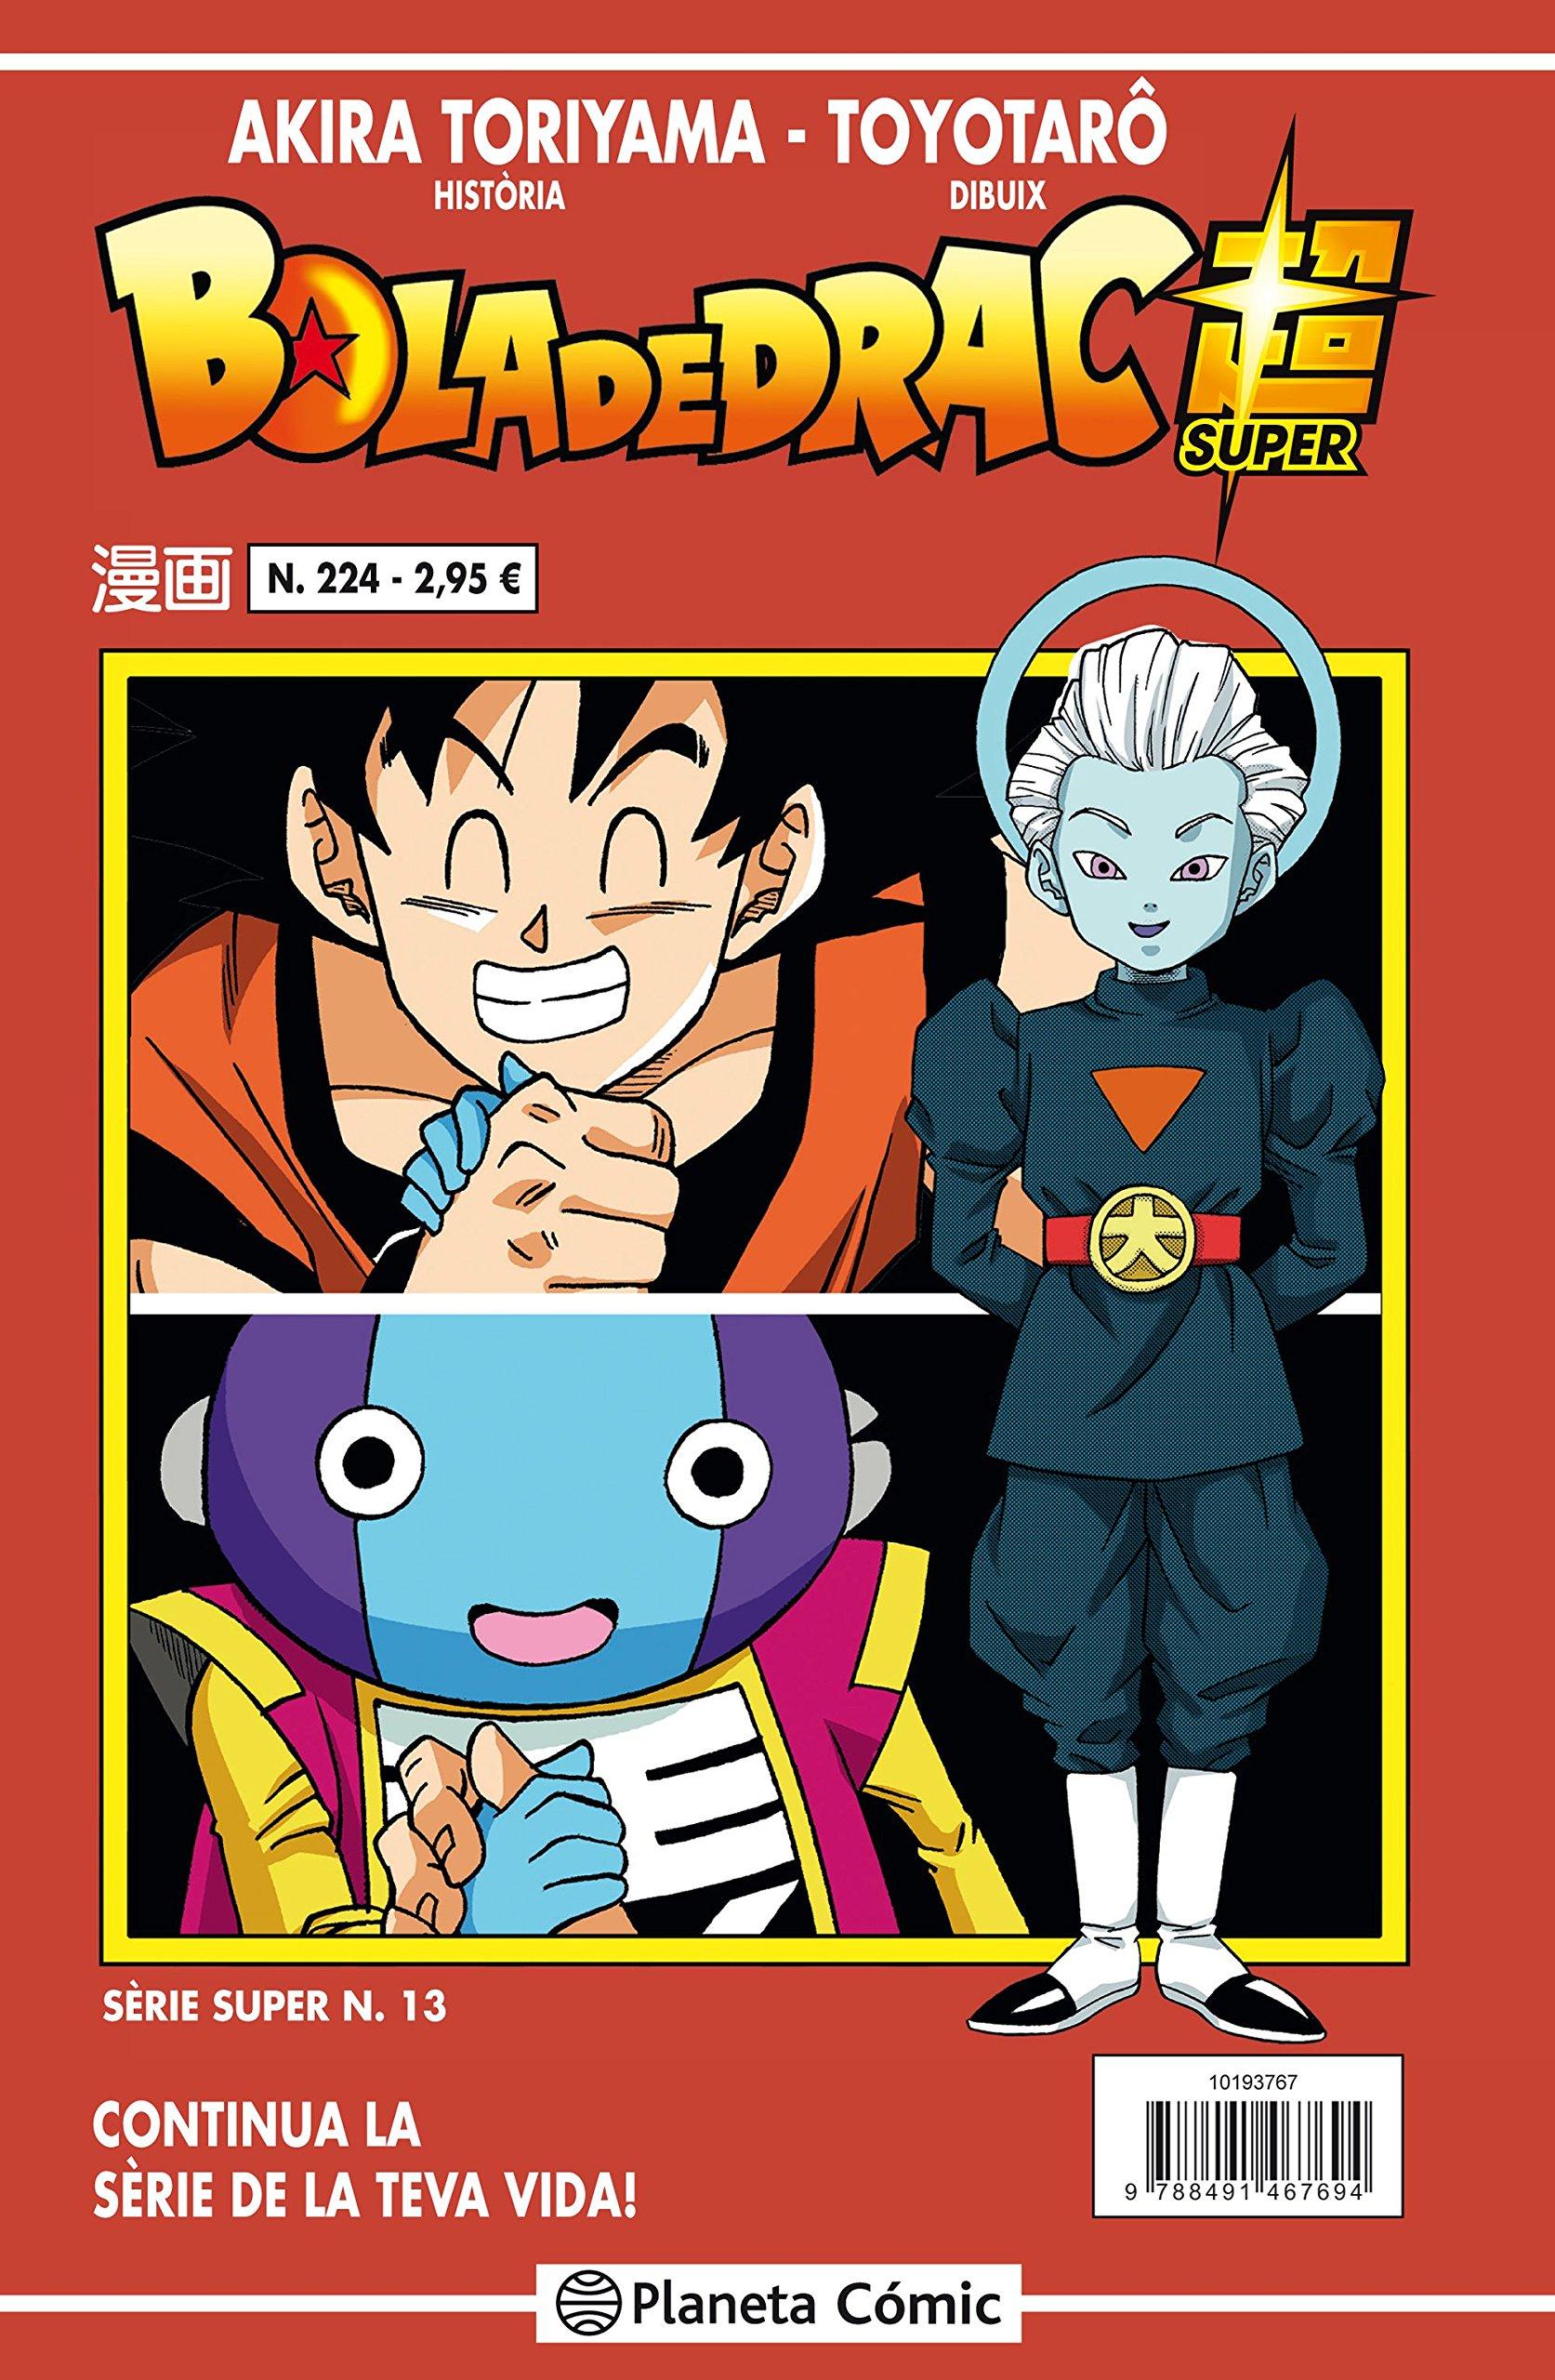 Bola de Drac Sèrie vermella nº 224 (Manga Shonen) (Catalán) Tapa blanda – 16 oct 2018 Akira Toriyama Daruma Planeta DeAgostini Cómics 8491731318